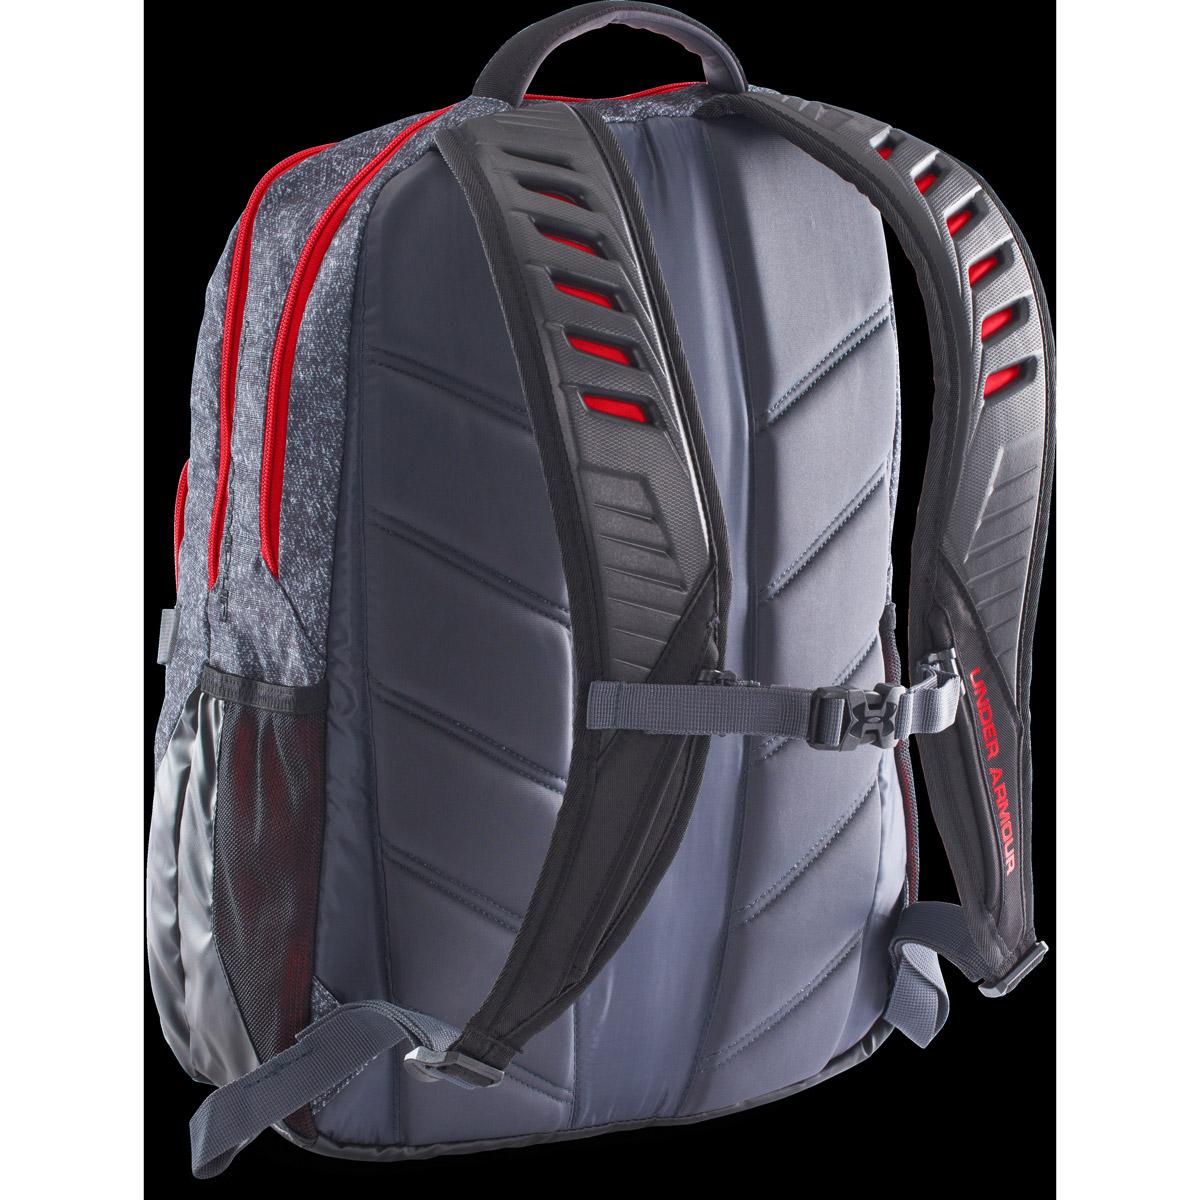 0de2f1eddc UNDER ARMOUR Camden Backpack II - Bob's Stores